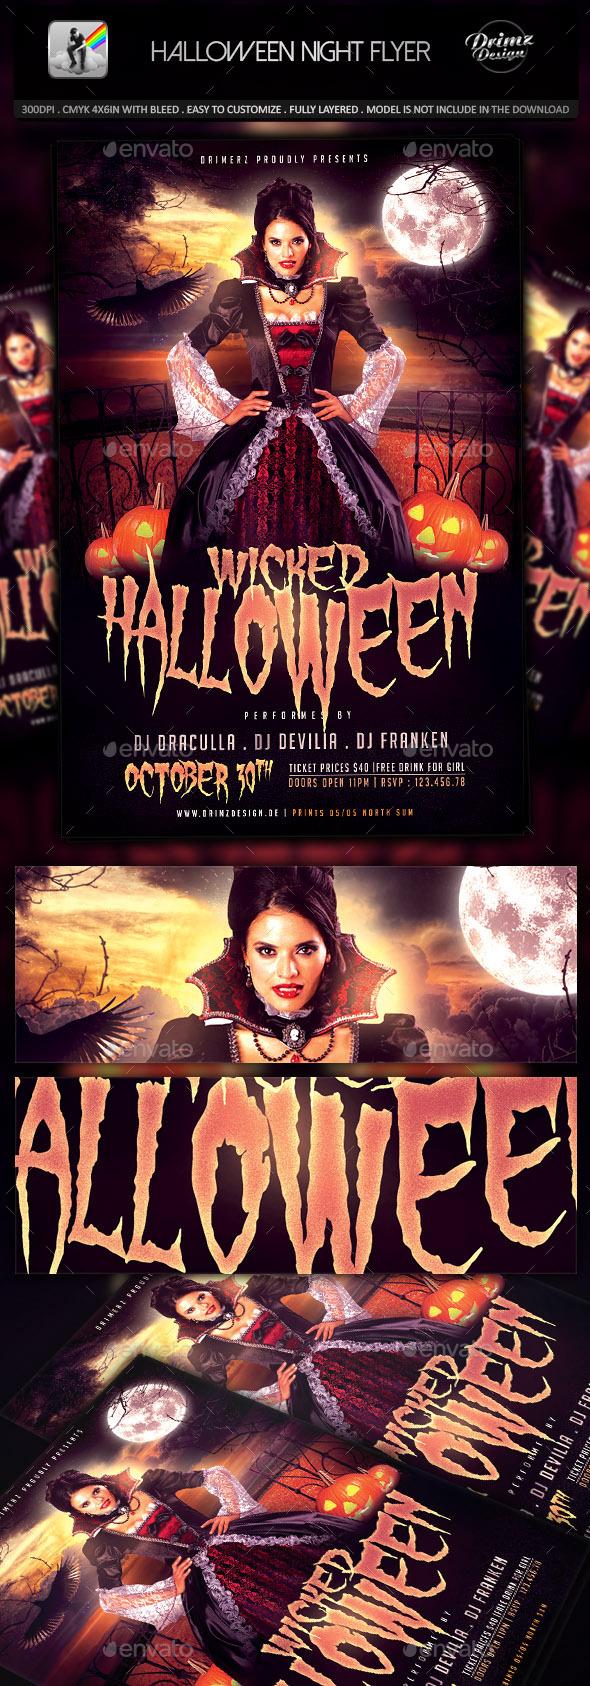 The Halloween Flyer